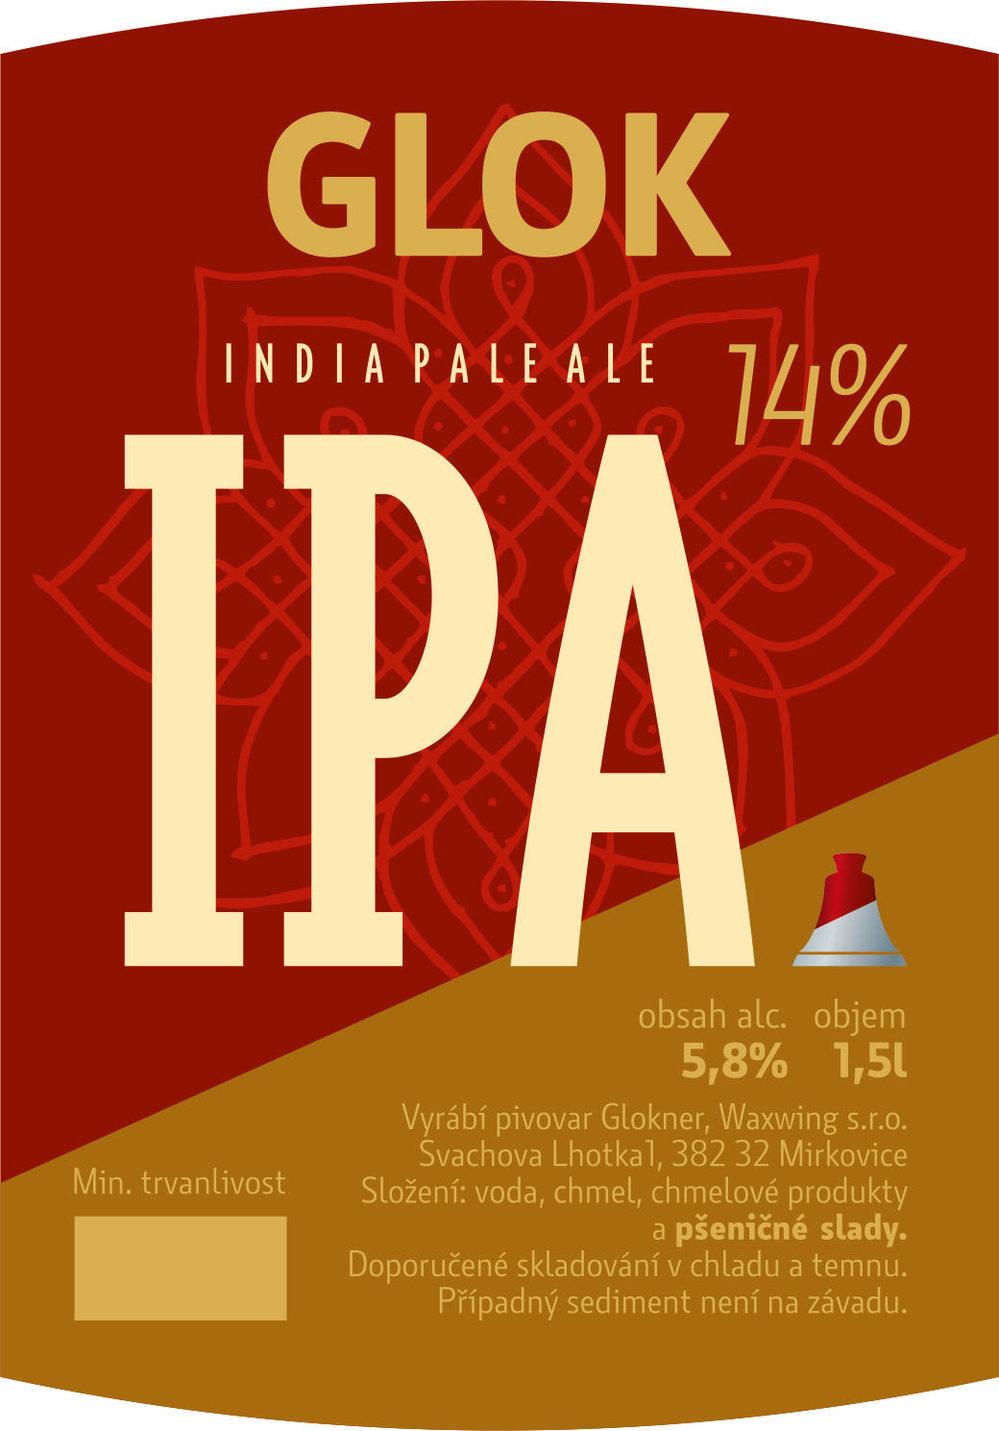 Glok 14 IPA